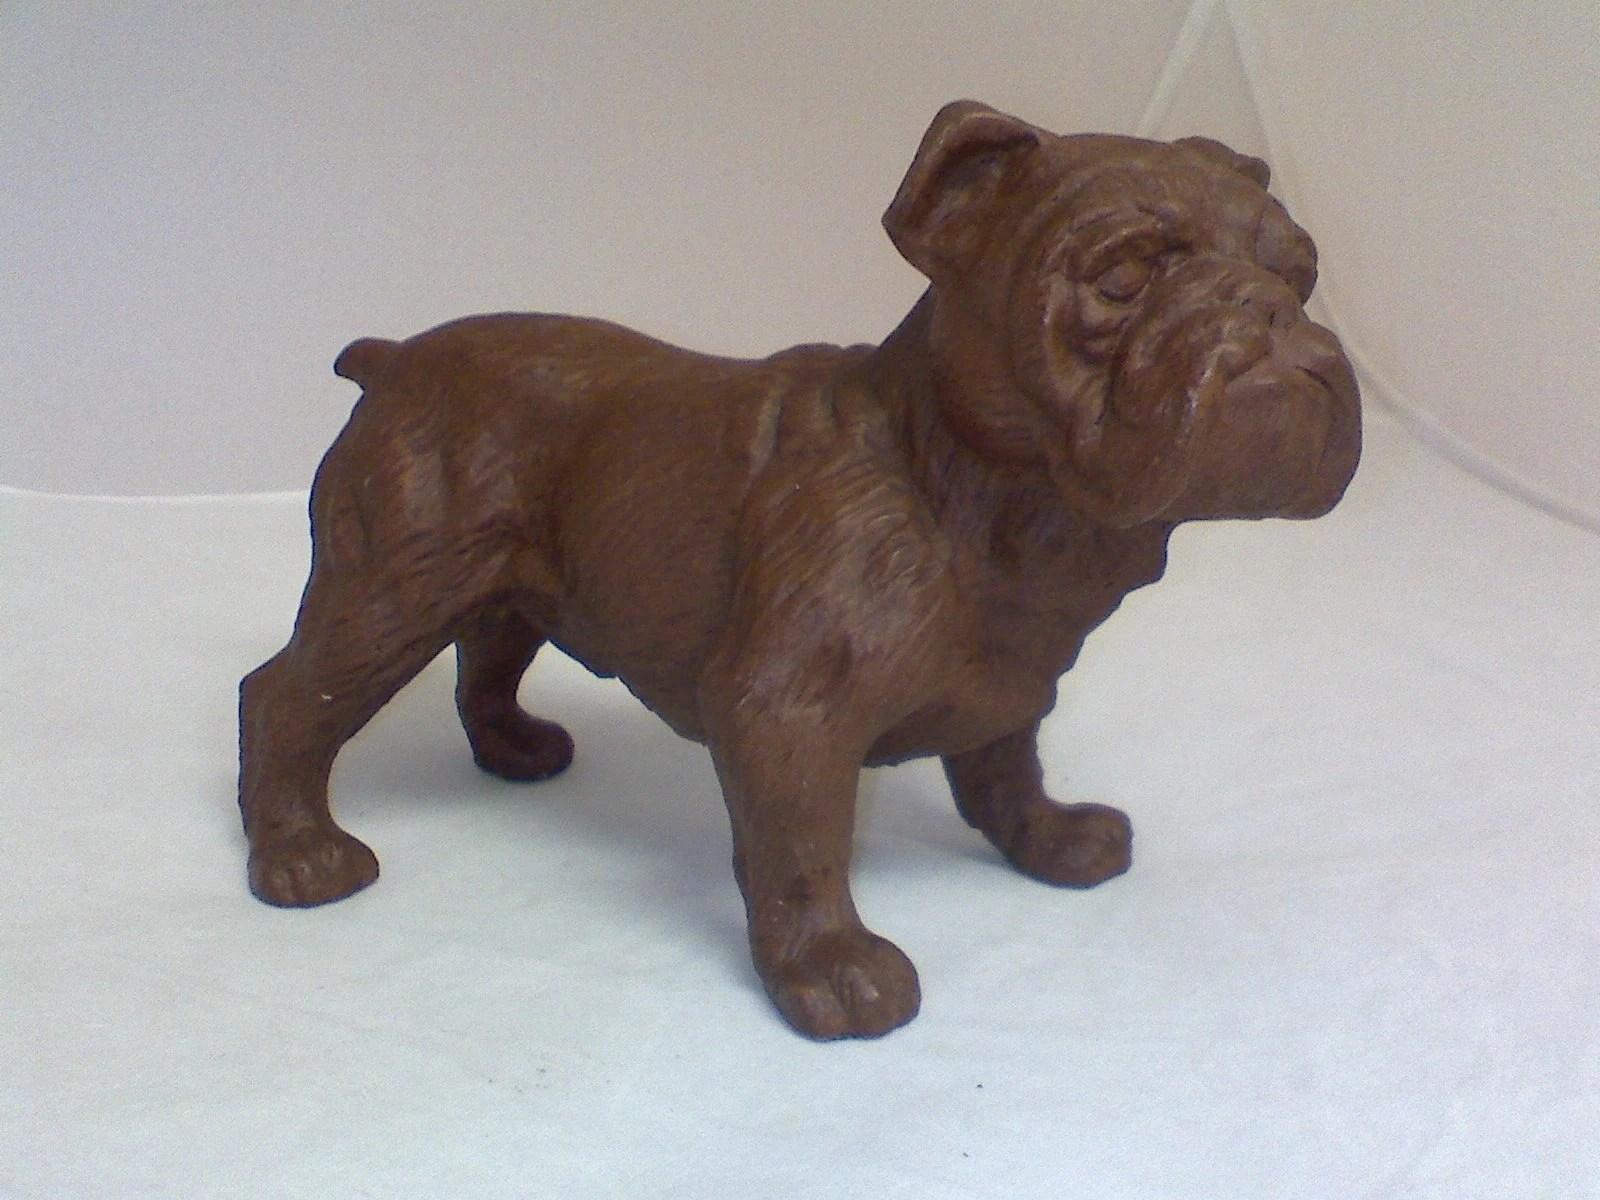 Heavy Realistic Bulldog Figurine